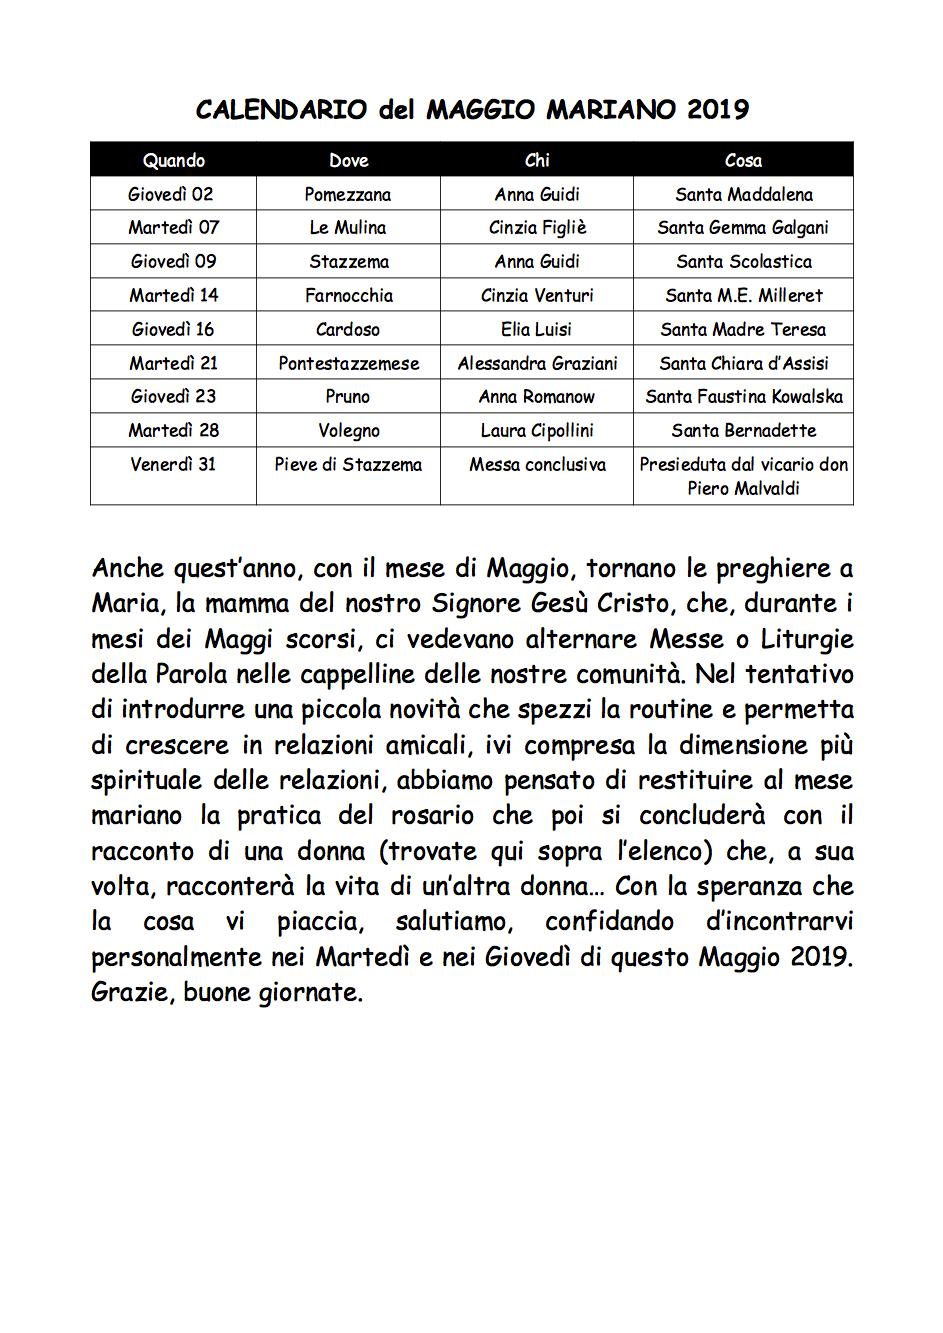 Esempio Calendario Affidamento Condiviso.Homepage Stazzema Chiesa